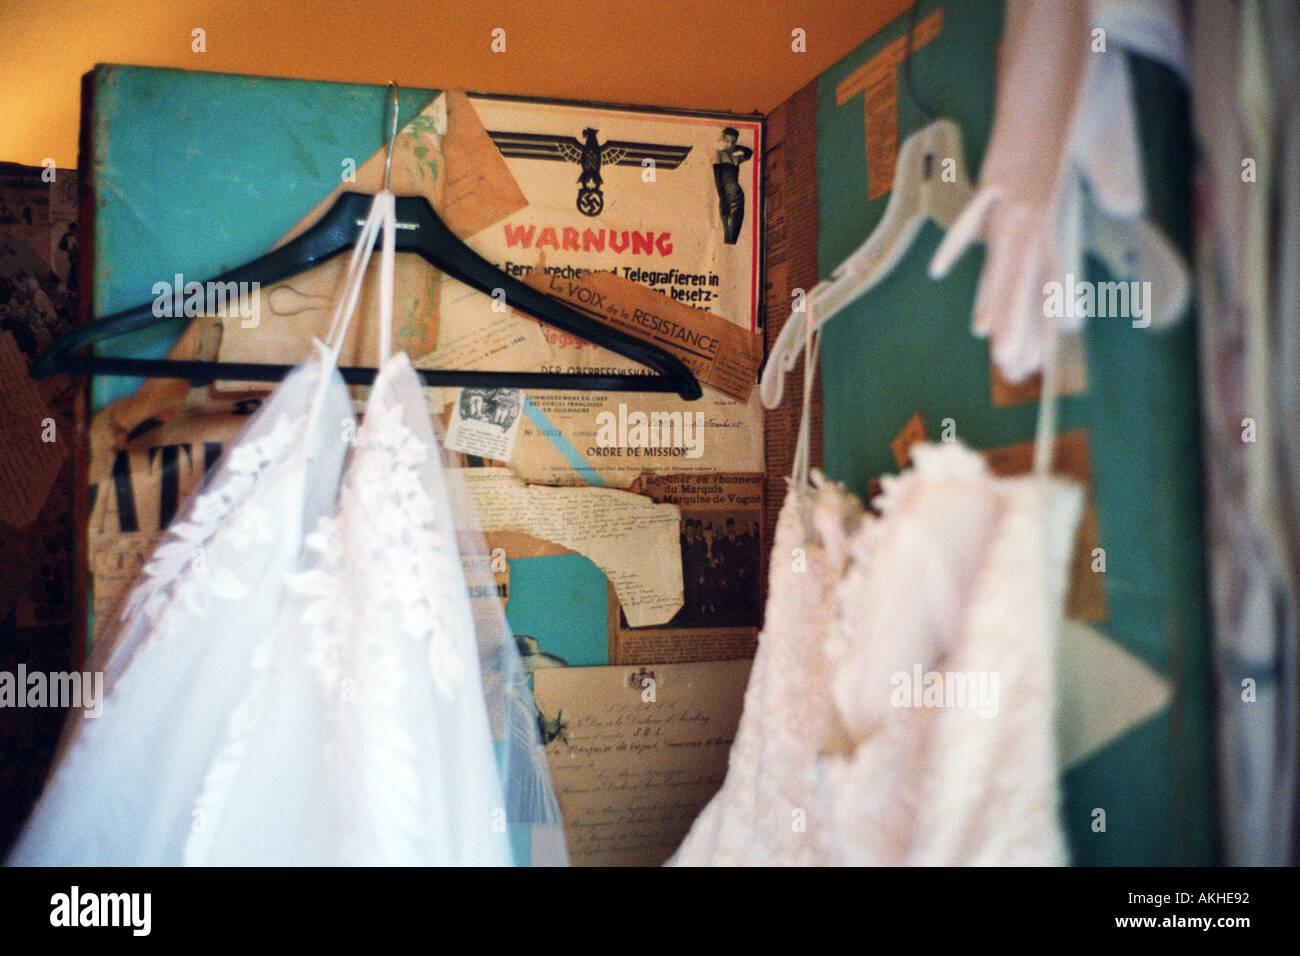 Wedding Dress Hung Stockfotos & Wedding Dress Hung Bilder - Alamy